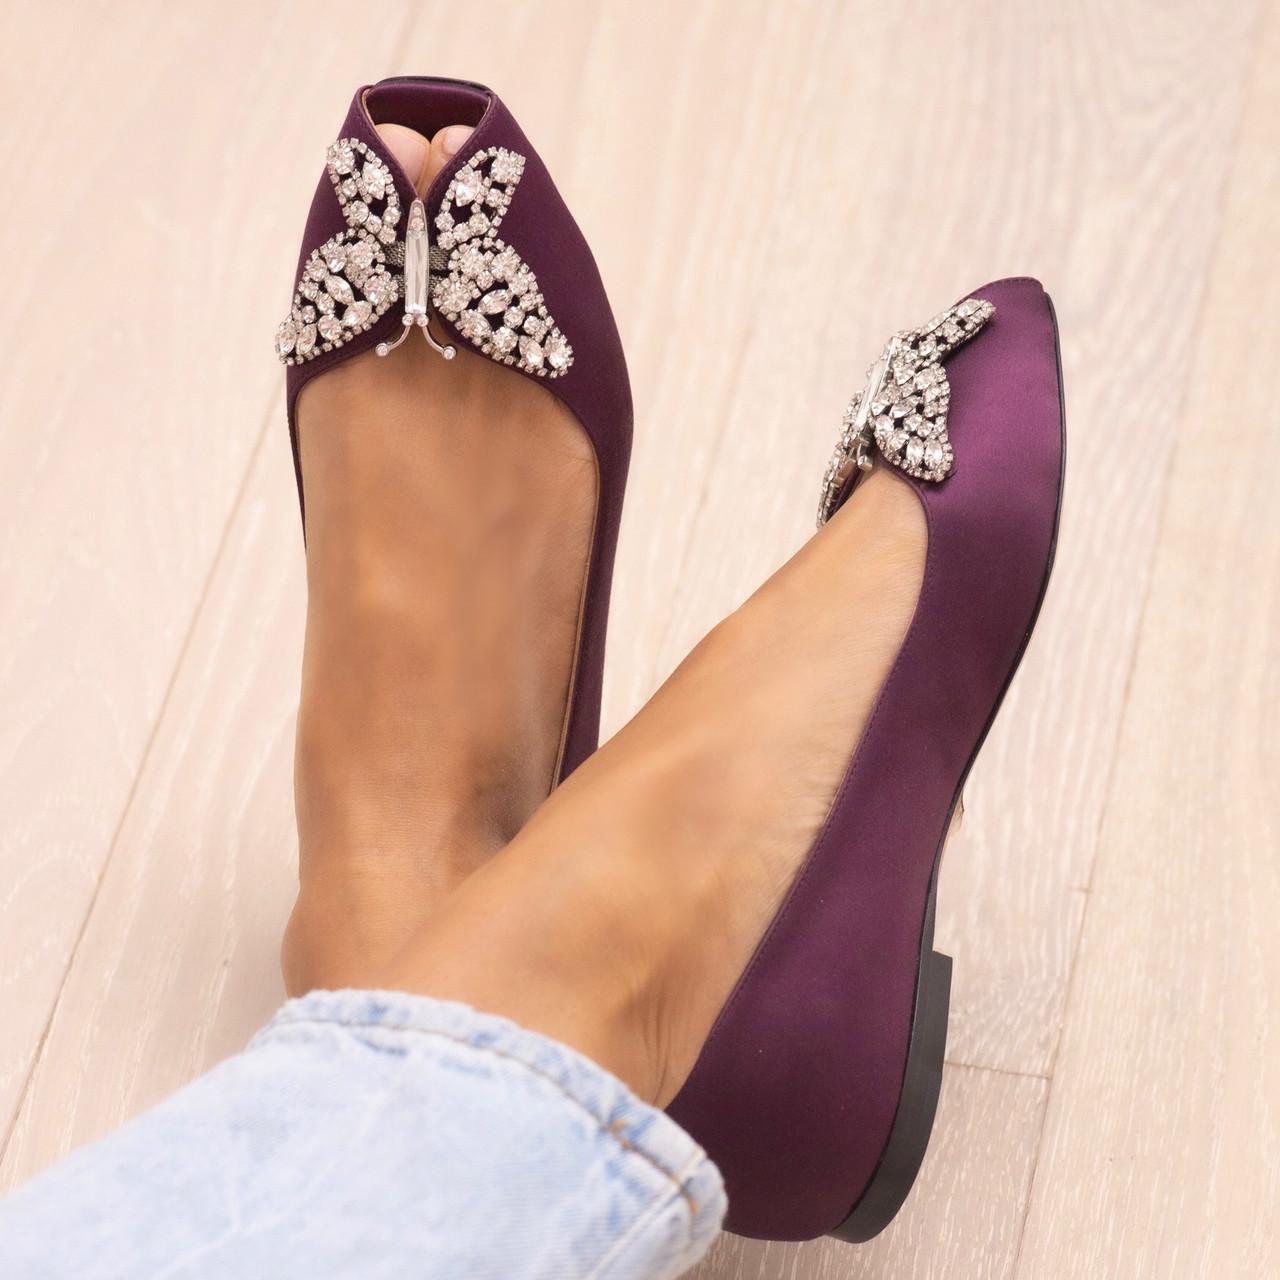 Liana Ballerina Imperial Purple Satin